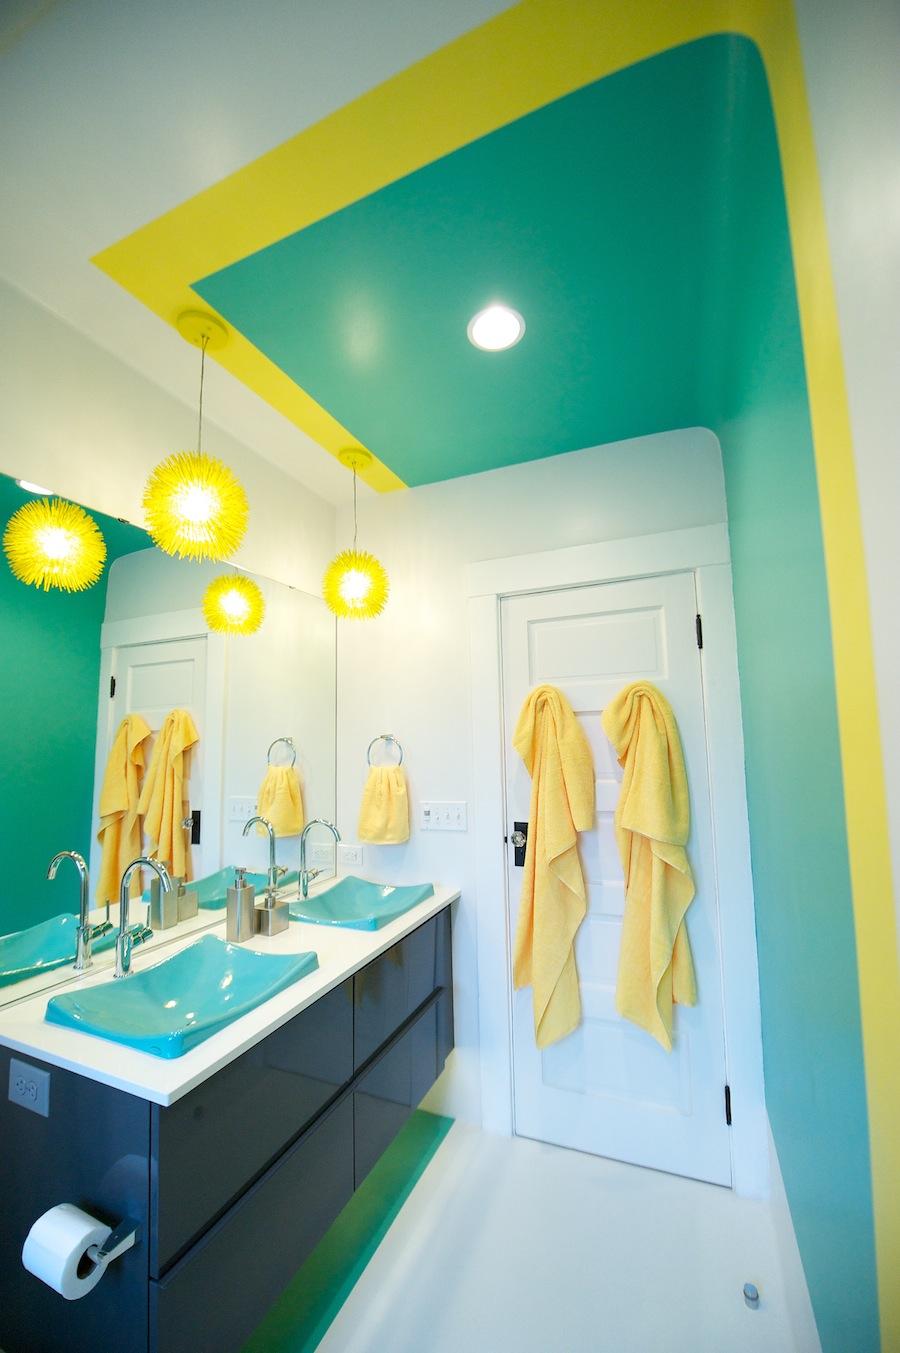 Желто-зеленые акценты в ванной